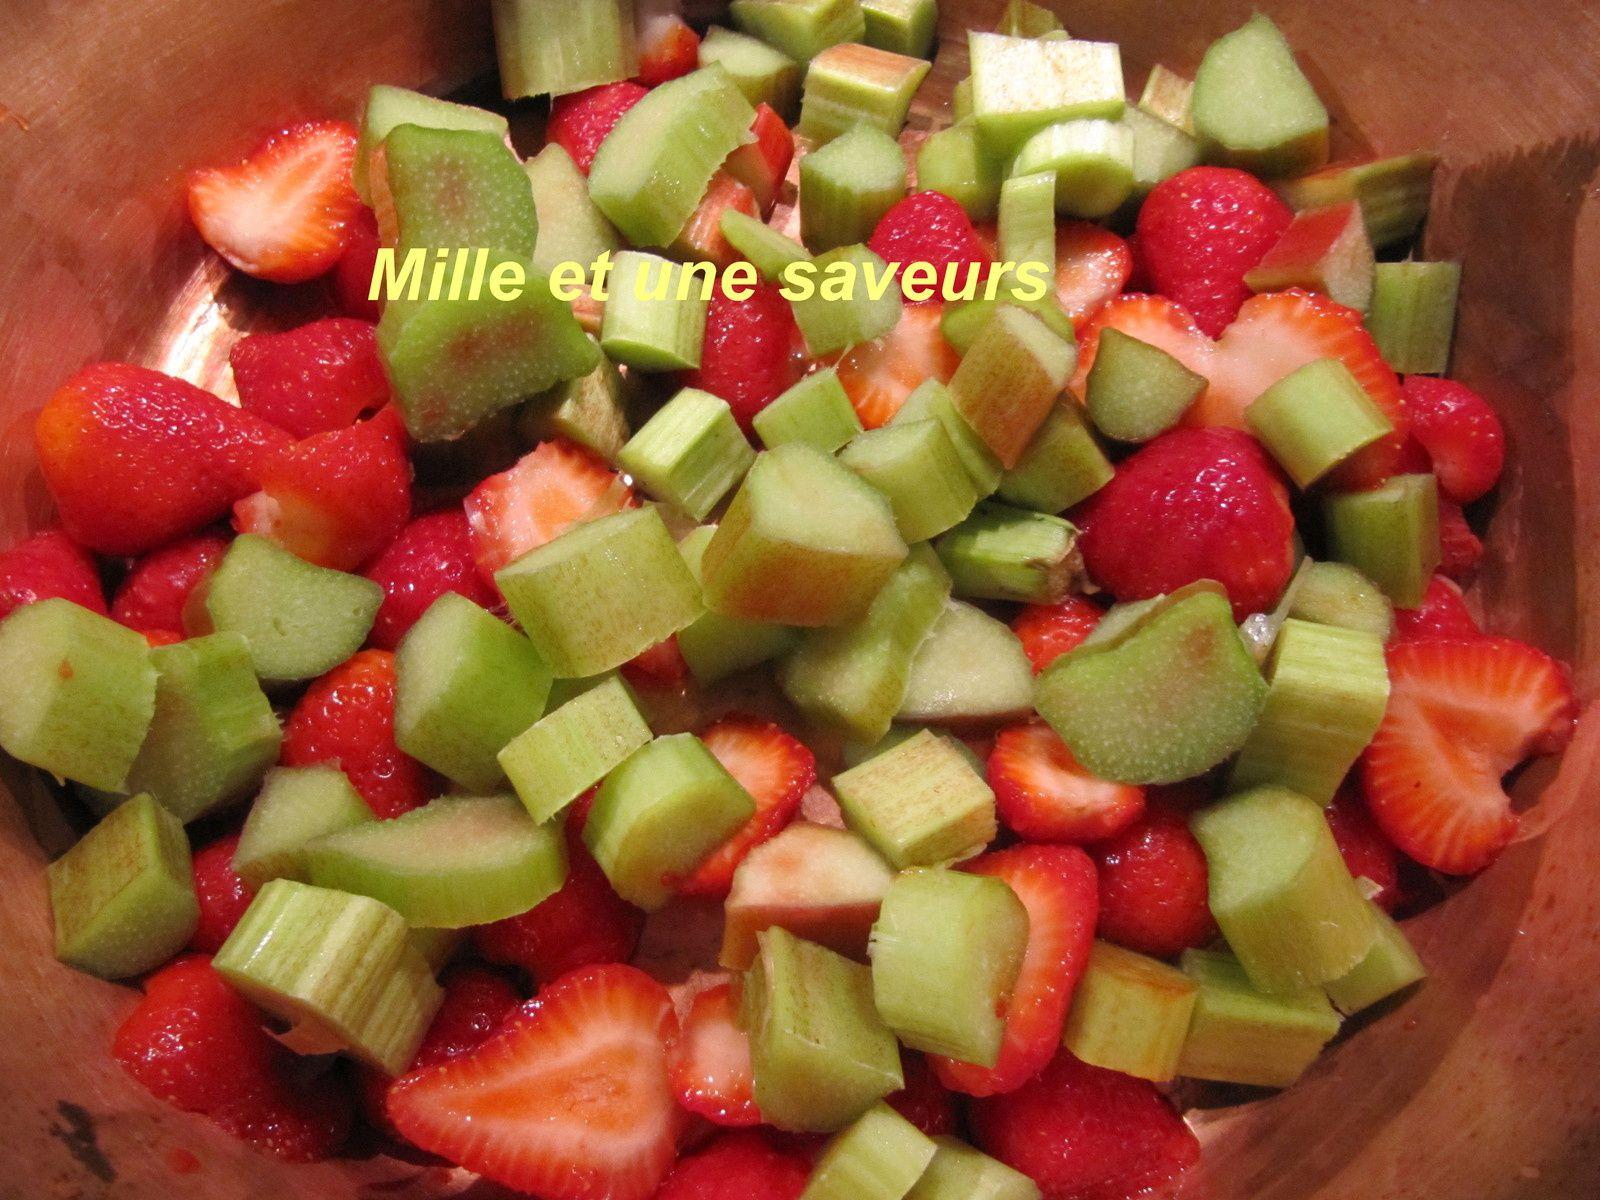 Confiture rhubarbe fraise et confiture rhubarbe banane